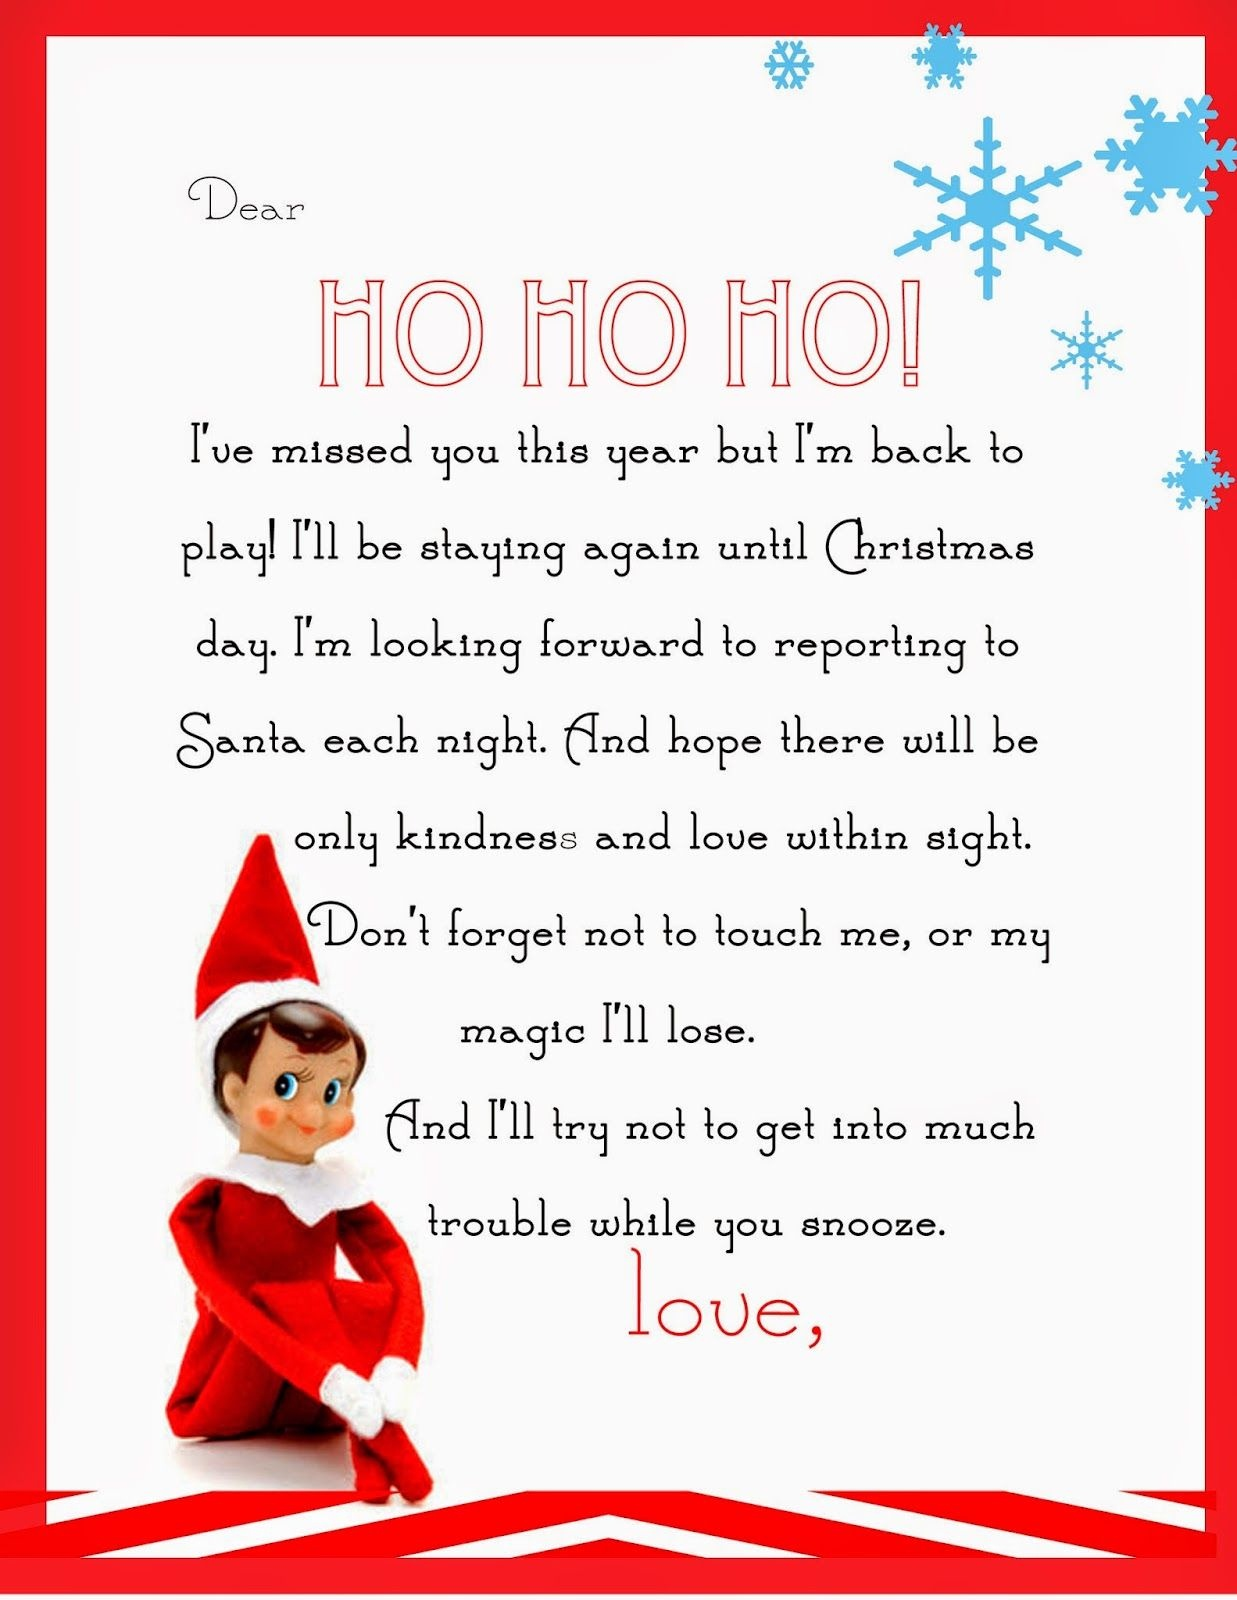 Elf On The Shelf Letter {Free Printable} | Elf On The Shelf | Elf On - Elf On A Shelf Goodbye Letter Free Printable